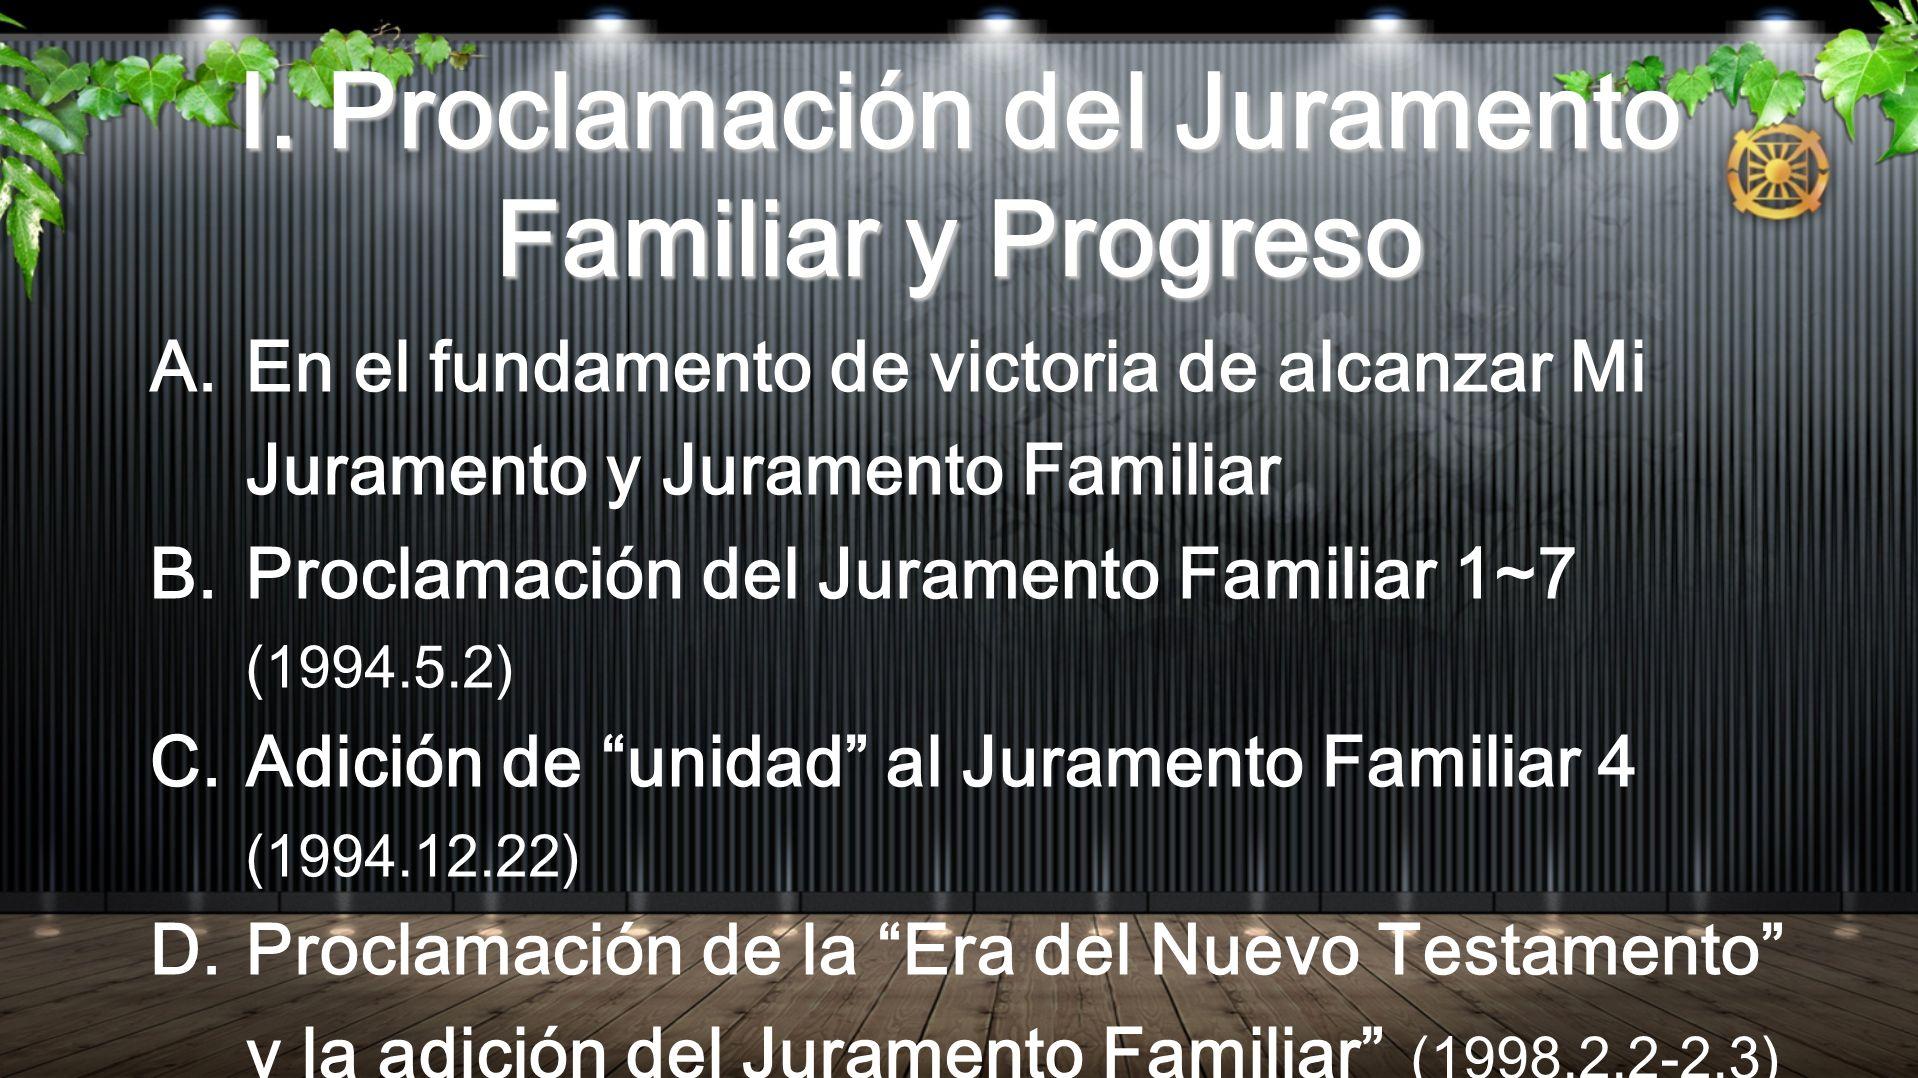 Juramento Familiar 2 A.